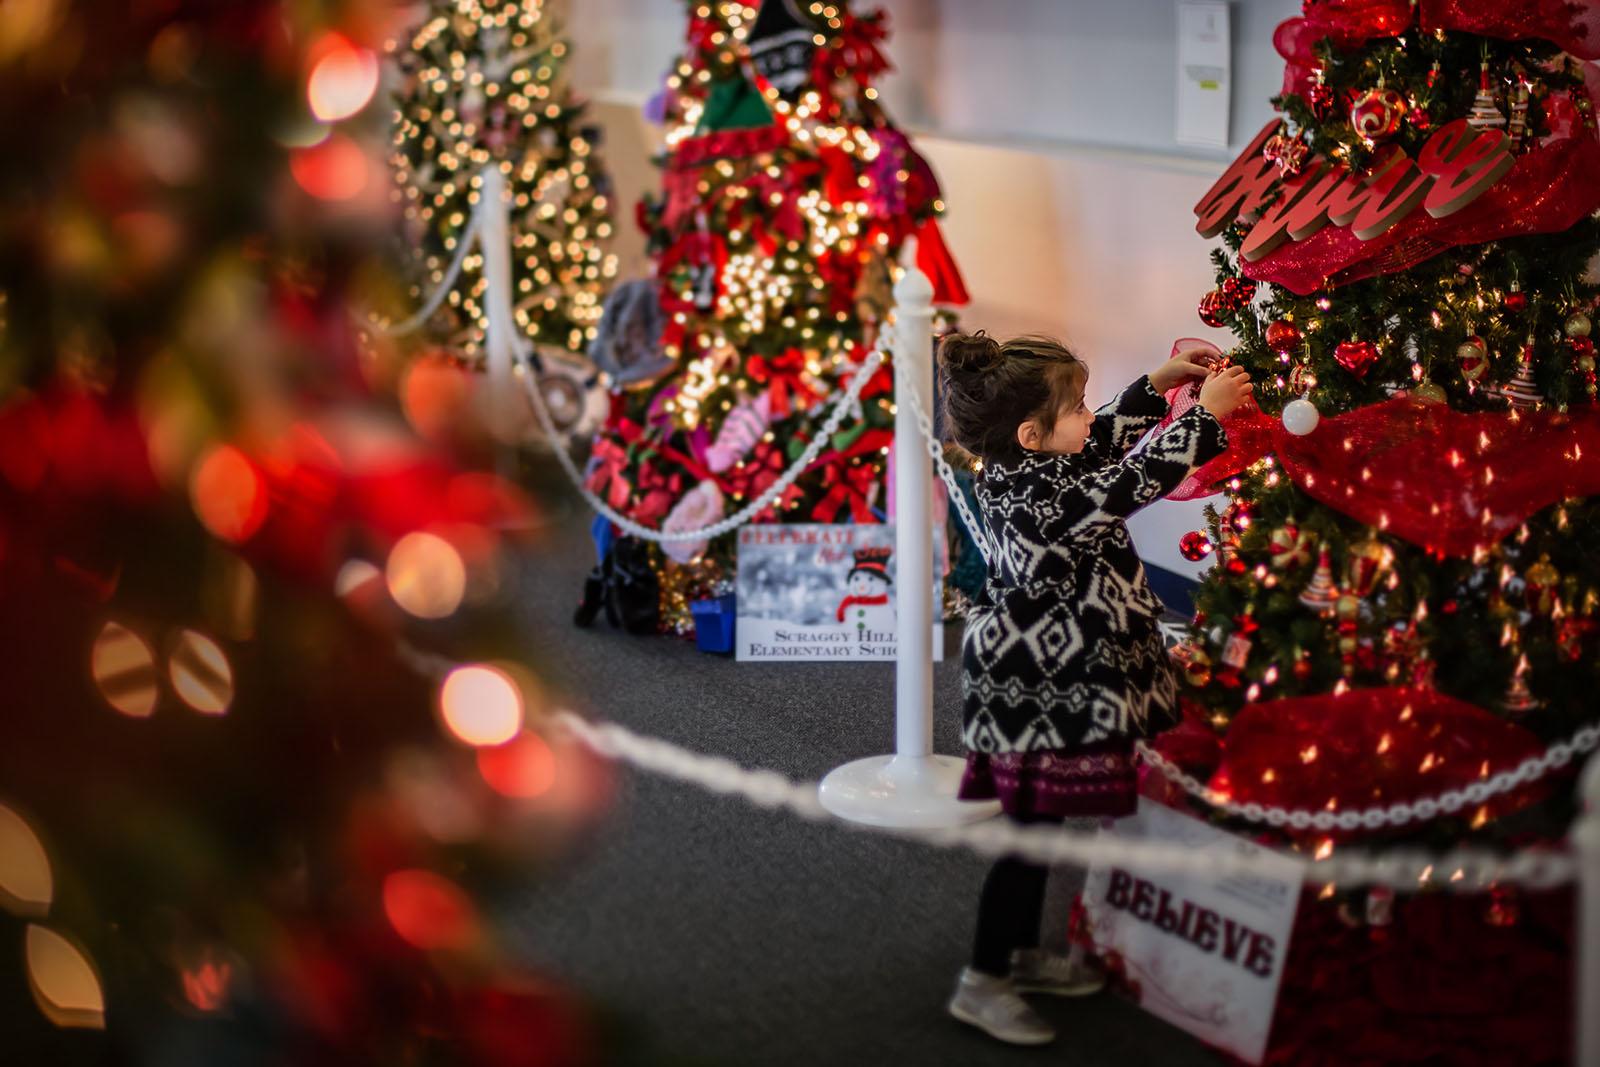 Christmas-holiday-photography-sopo-titvinidze-18.jpg